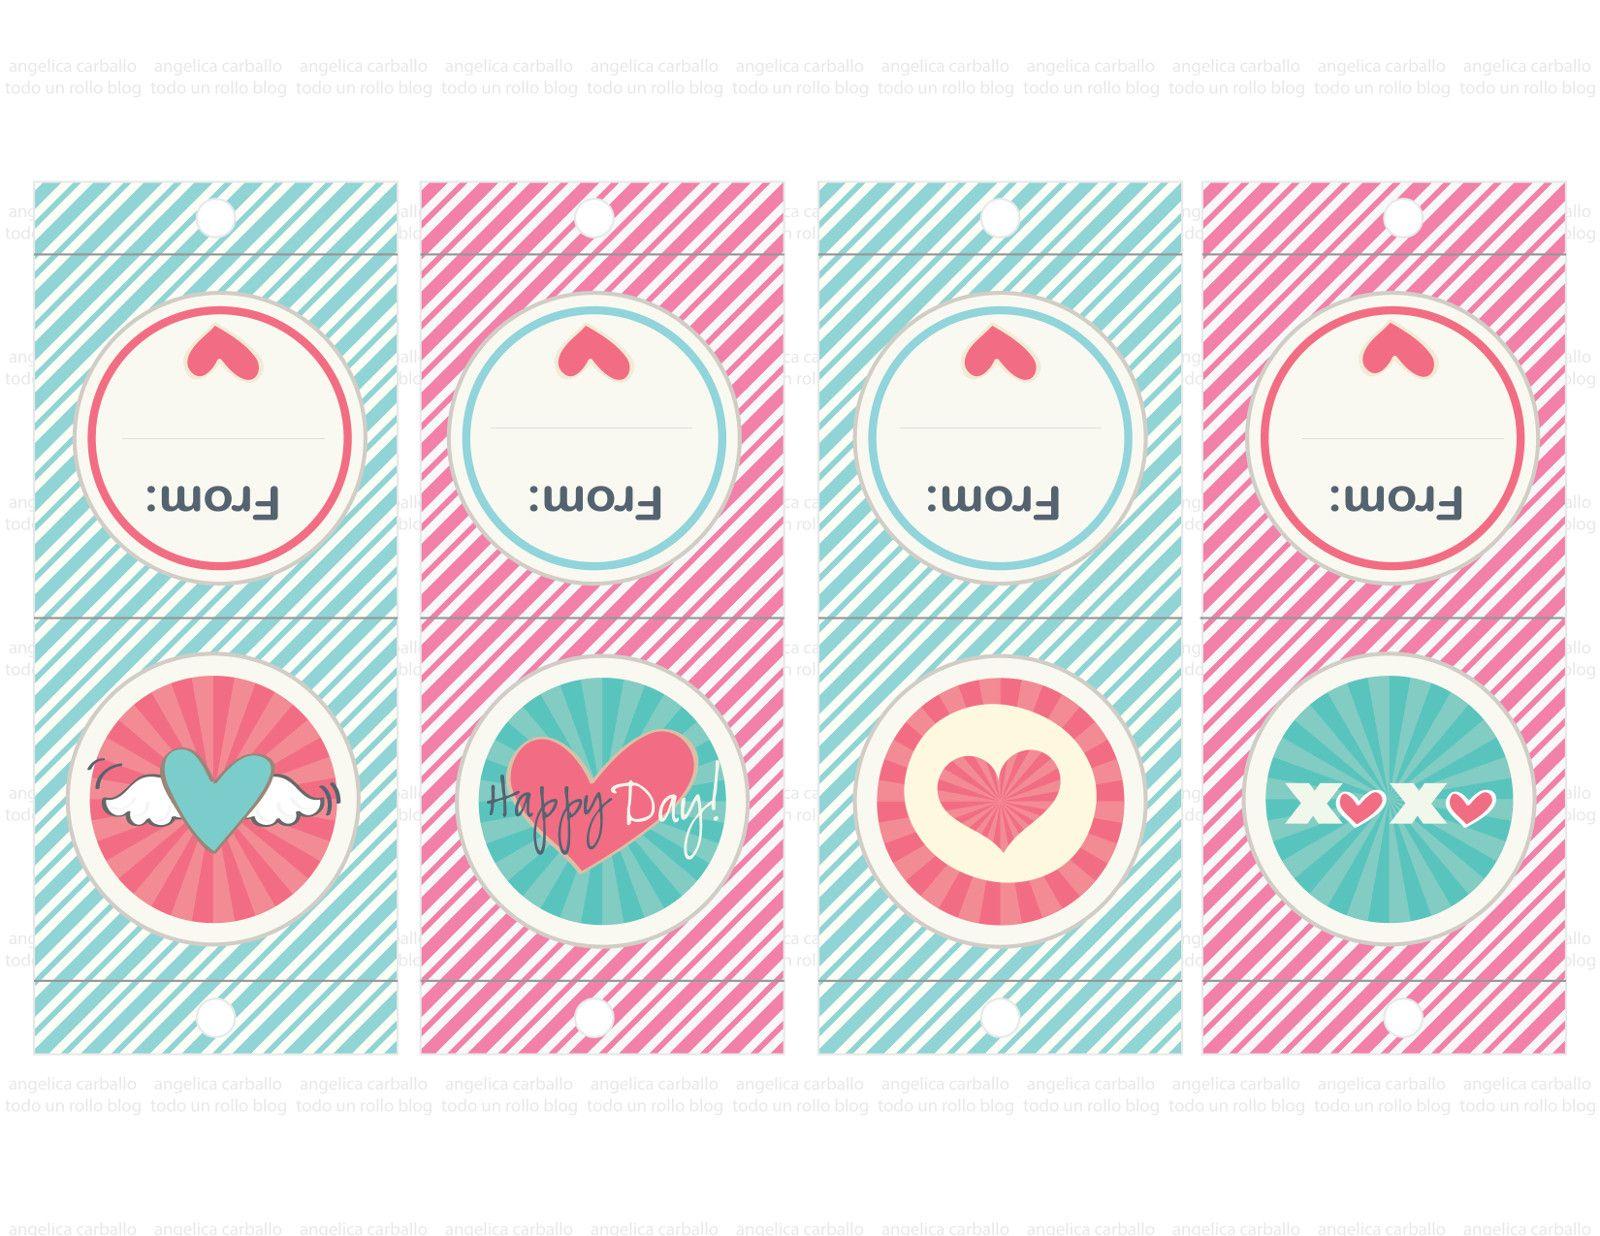 Free valentine printable for lollipop ... gratis imprimible para ...